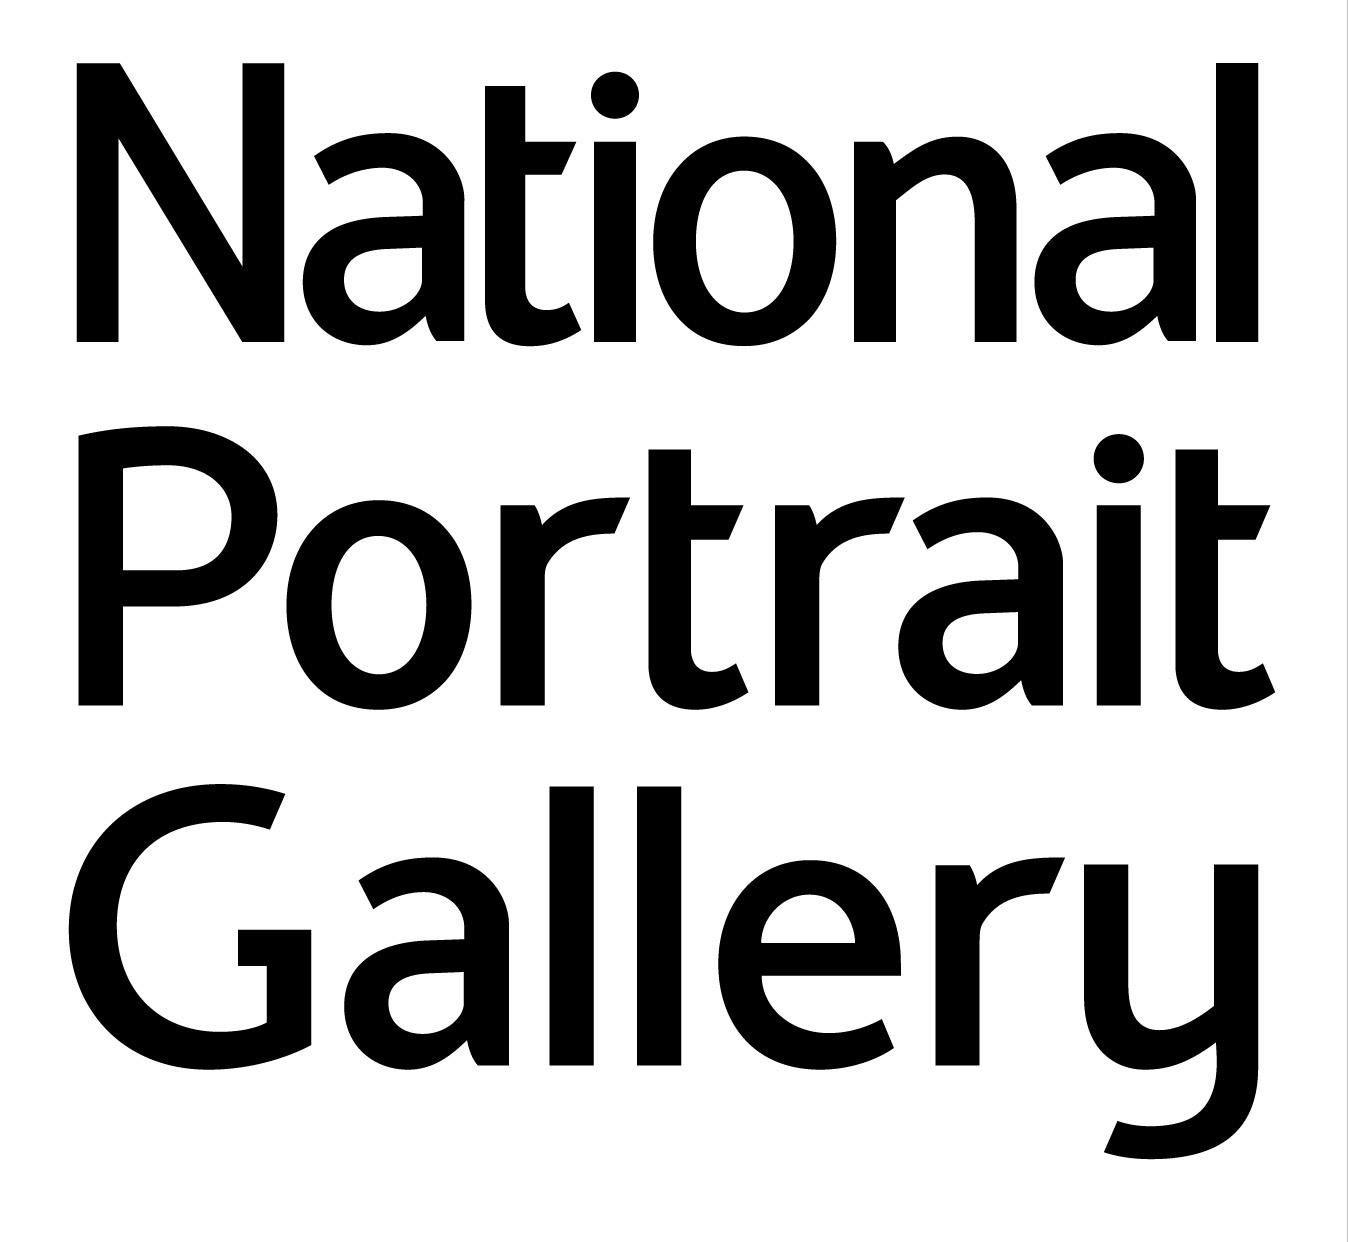 National Portrait Gallery | National portrait gallery, Graphic design blog,  Logo design